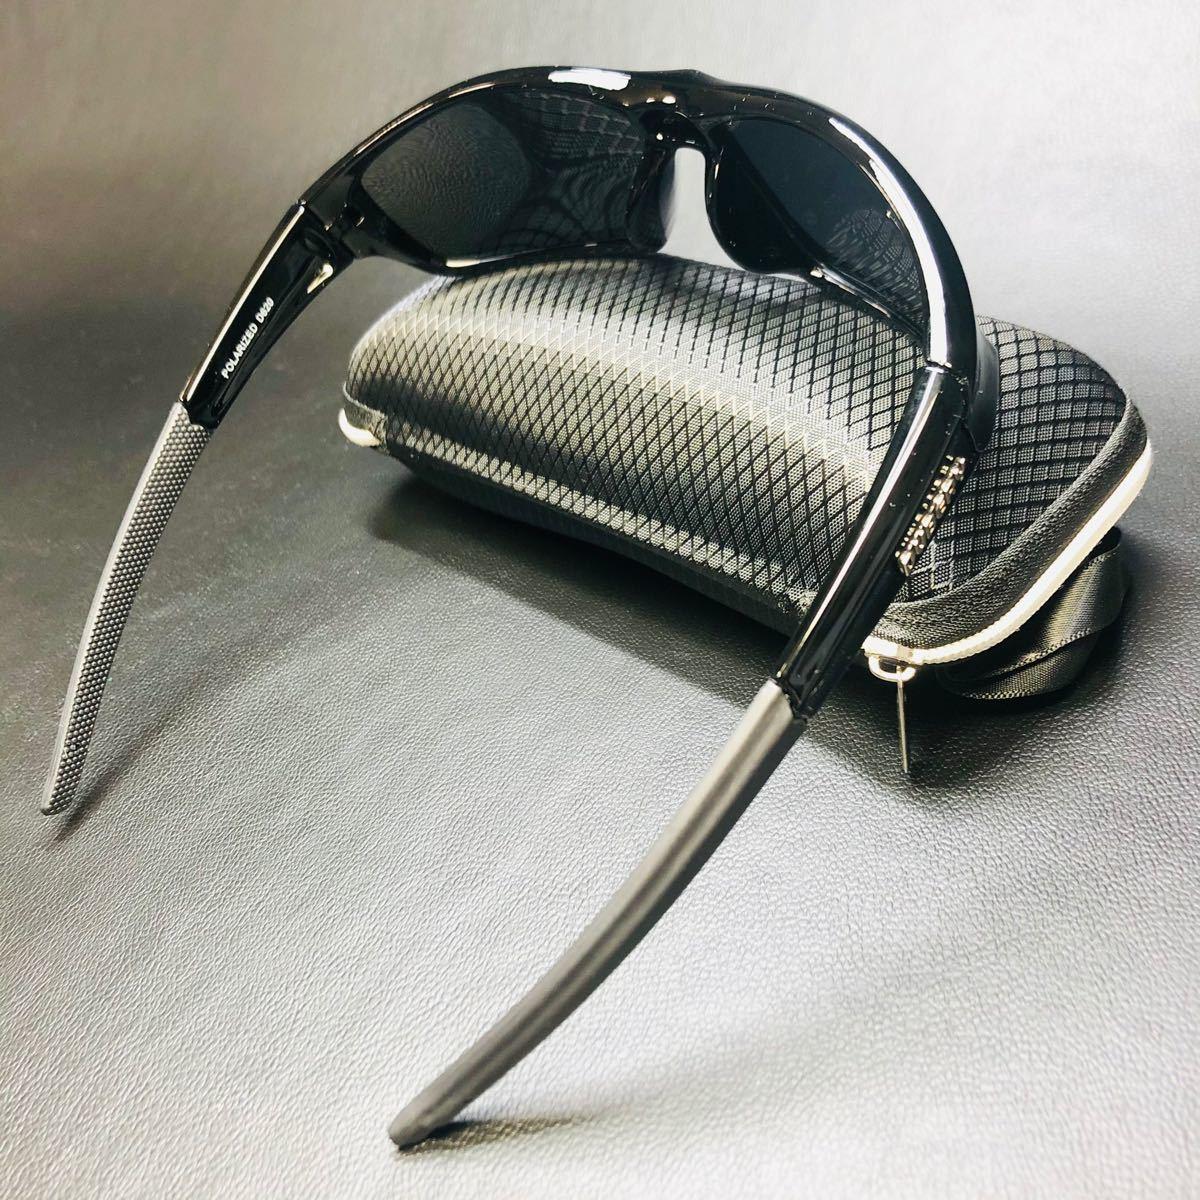 DUBERY サングラス 偏光グラス UV400 軽量 車  釣り アウトドア スポーツサングラス 超軽量